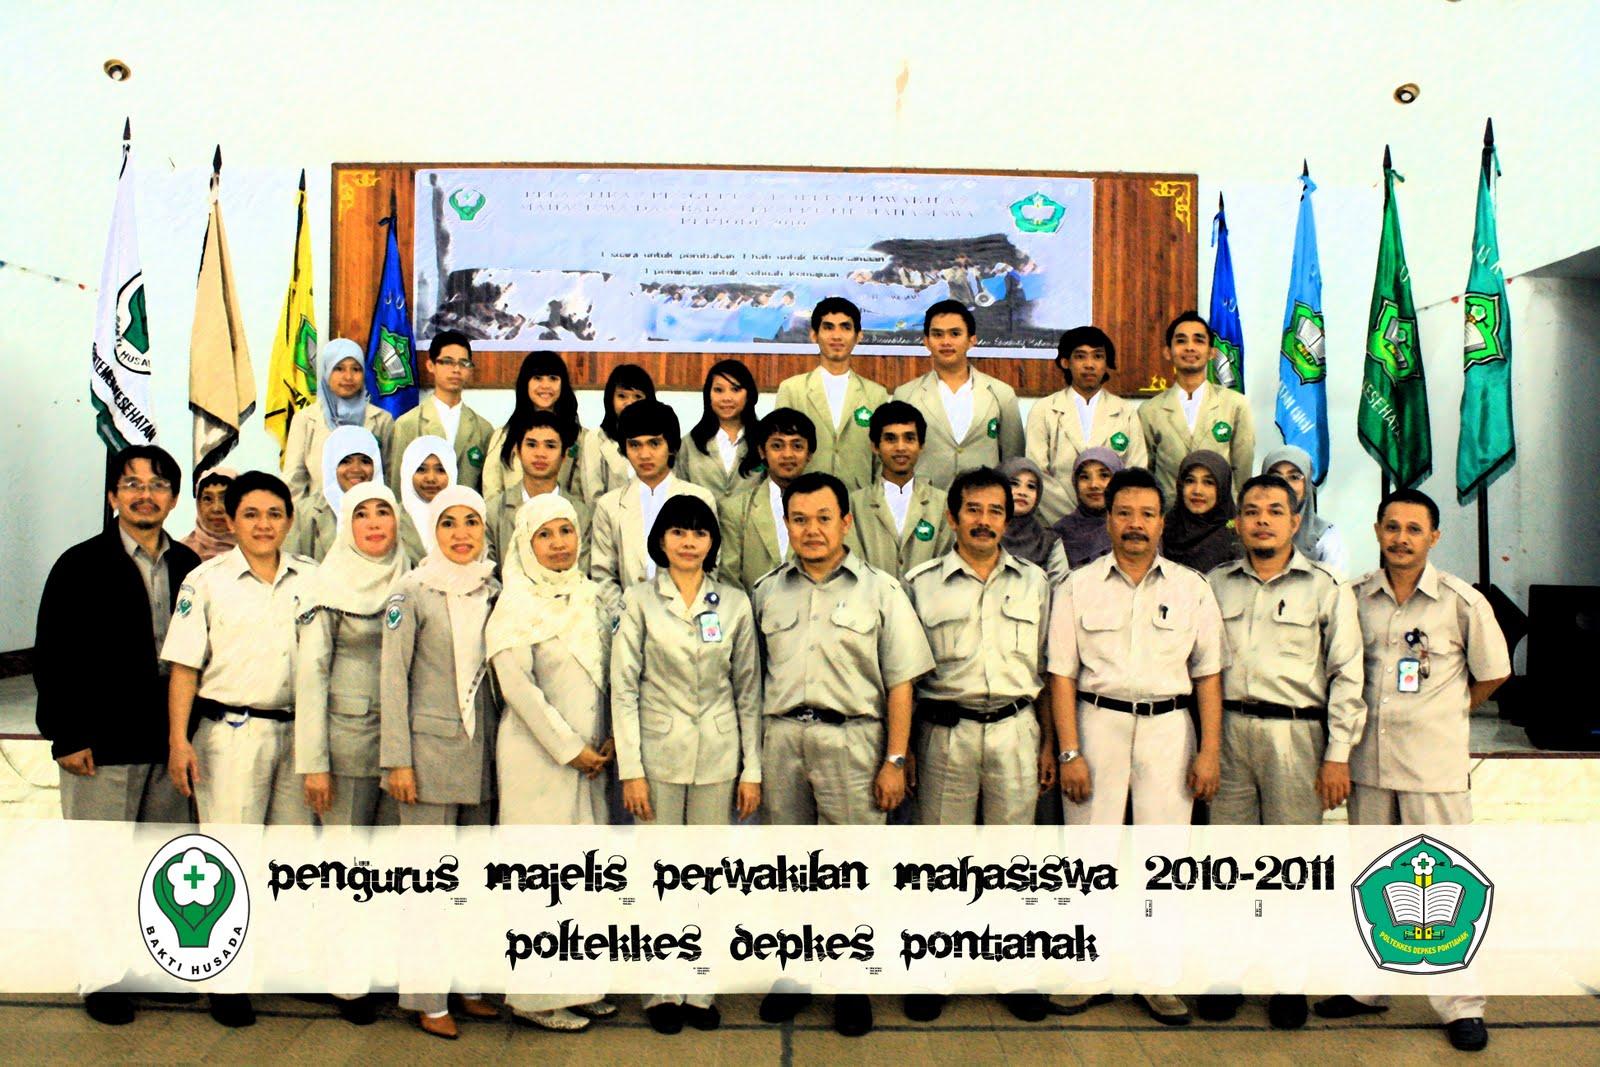 Politeknik Kesehatan Kementerian Kesehatan Yogyakarta